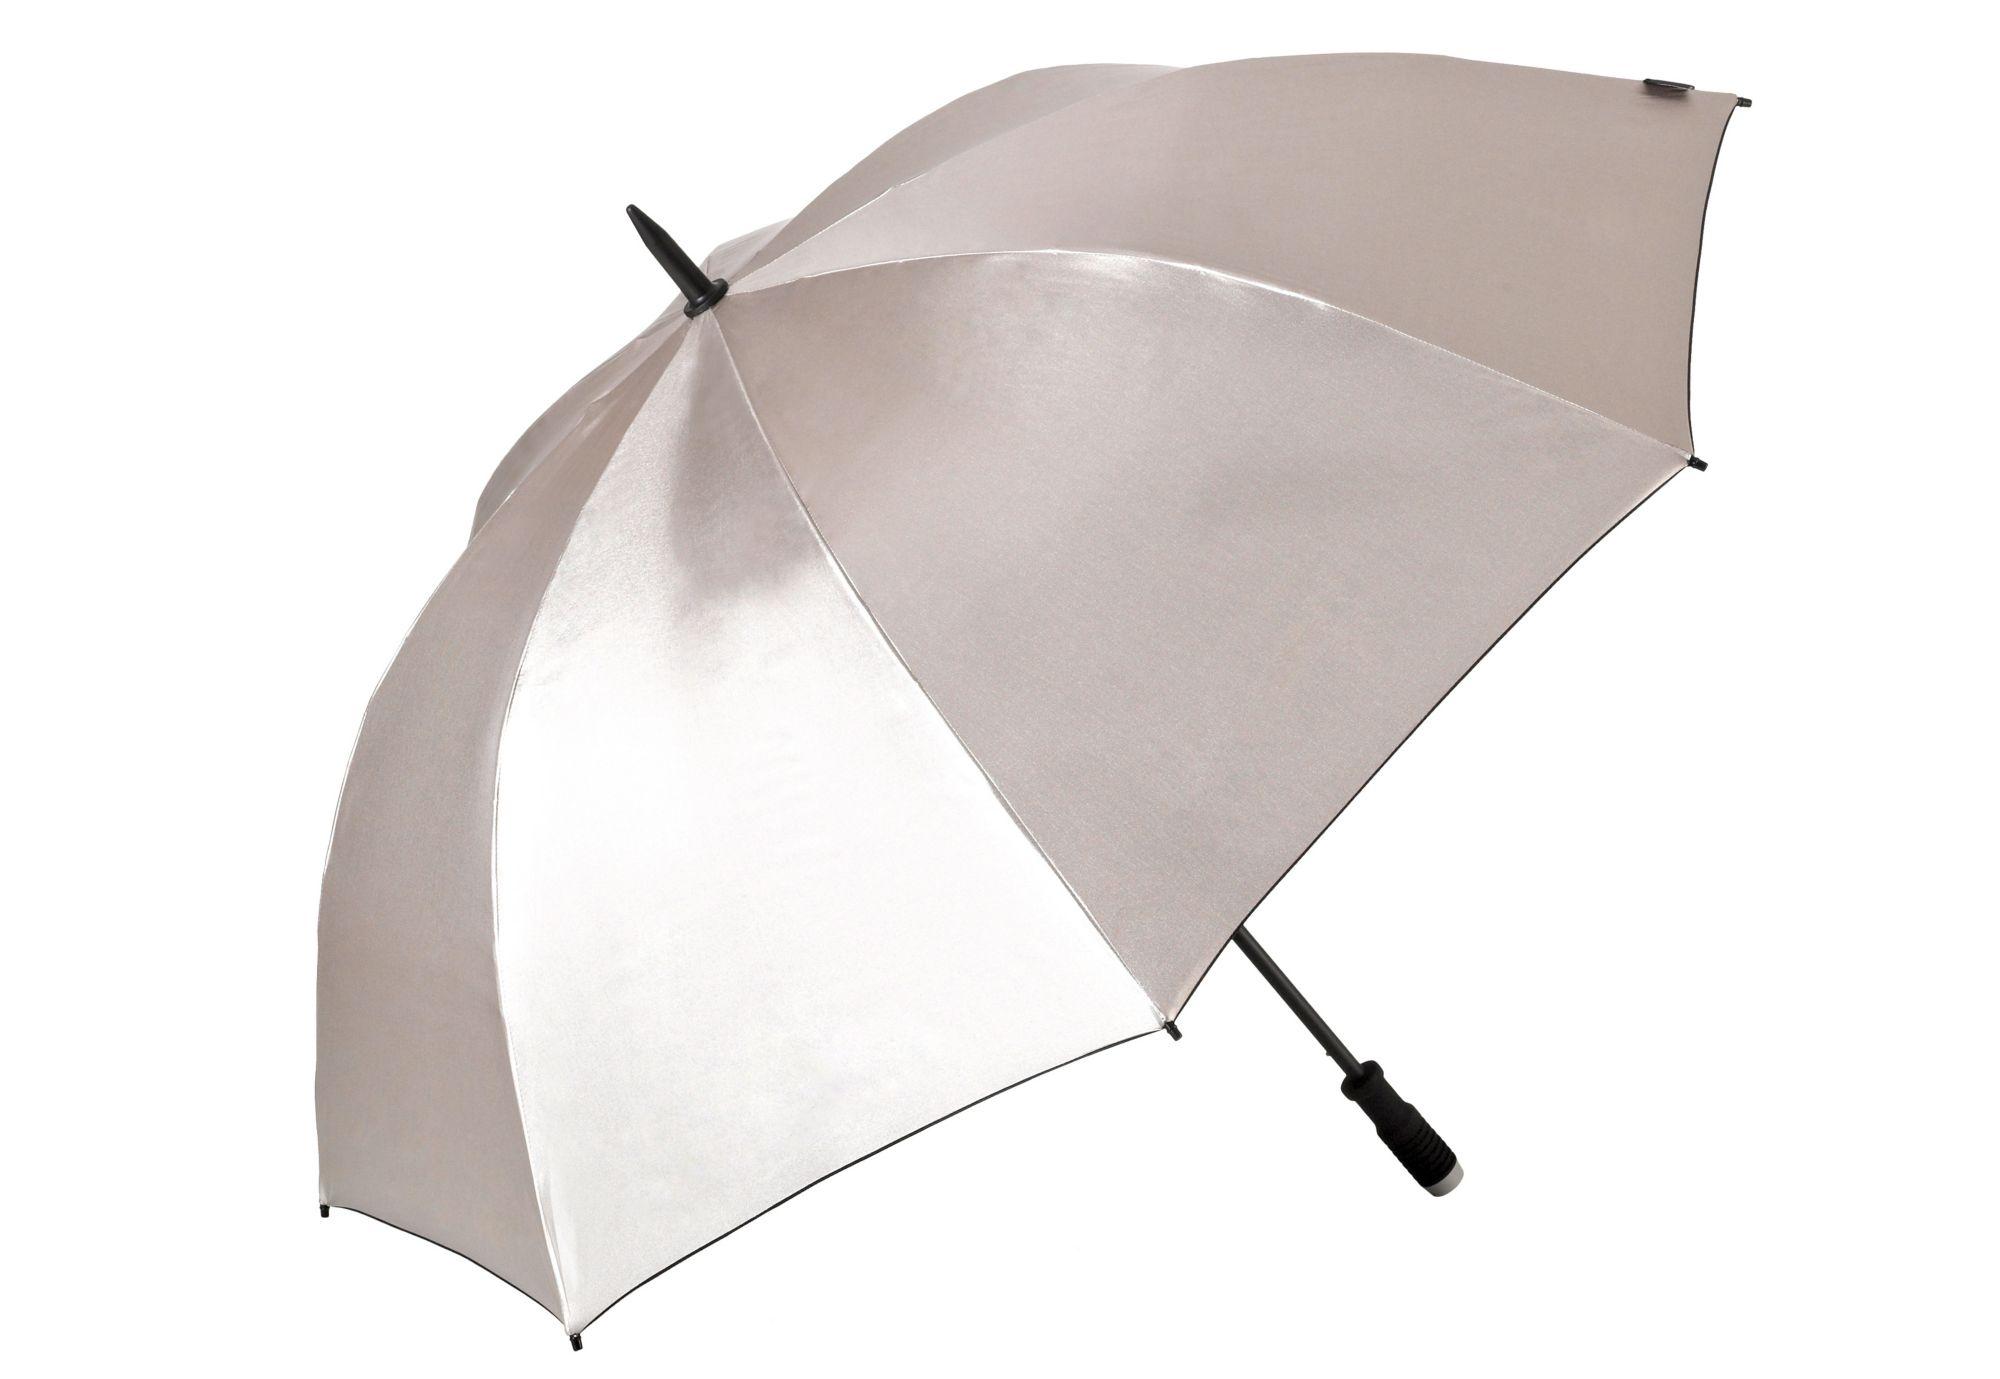 EUROSCHIRM® Euroschirm® Regenschirm Golfschirm, »birdiepal® windflex«